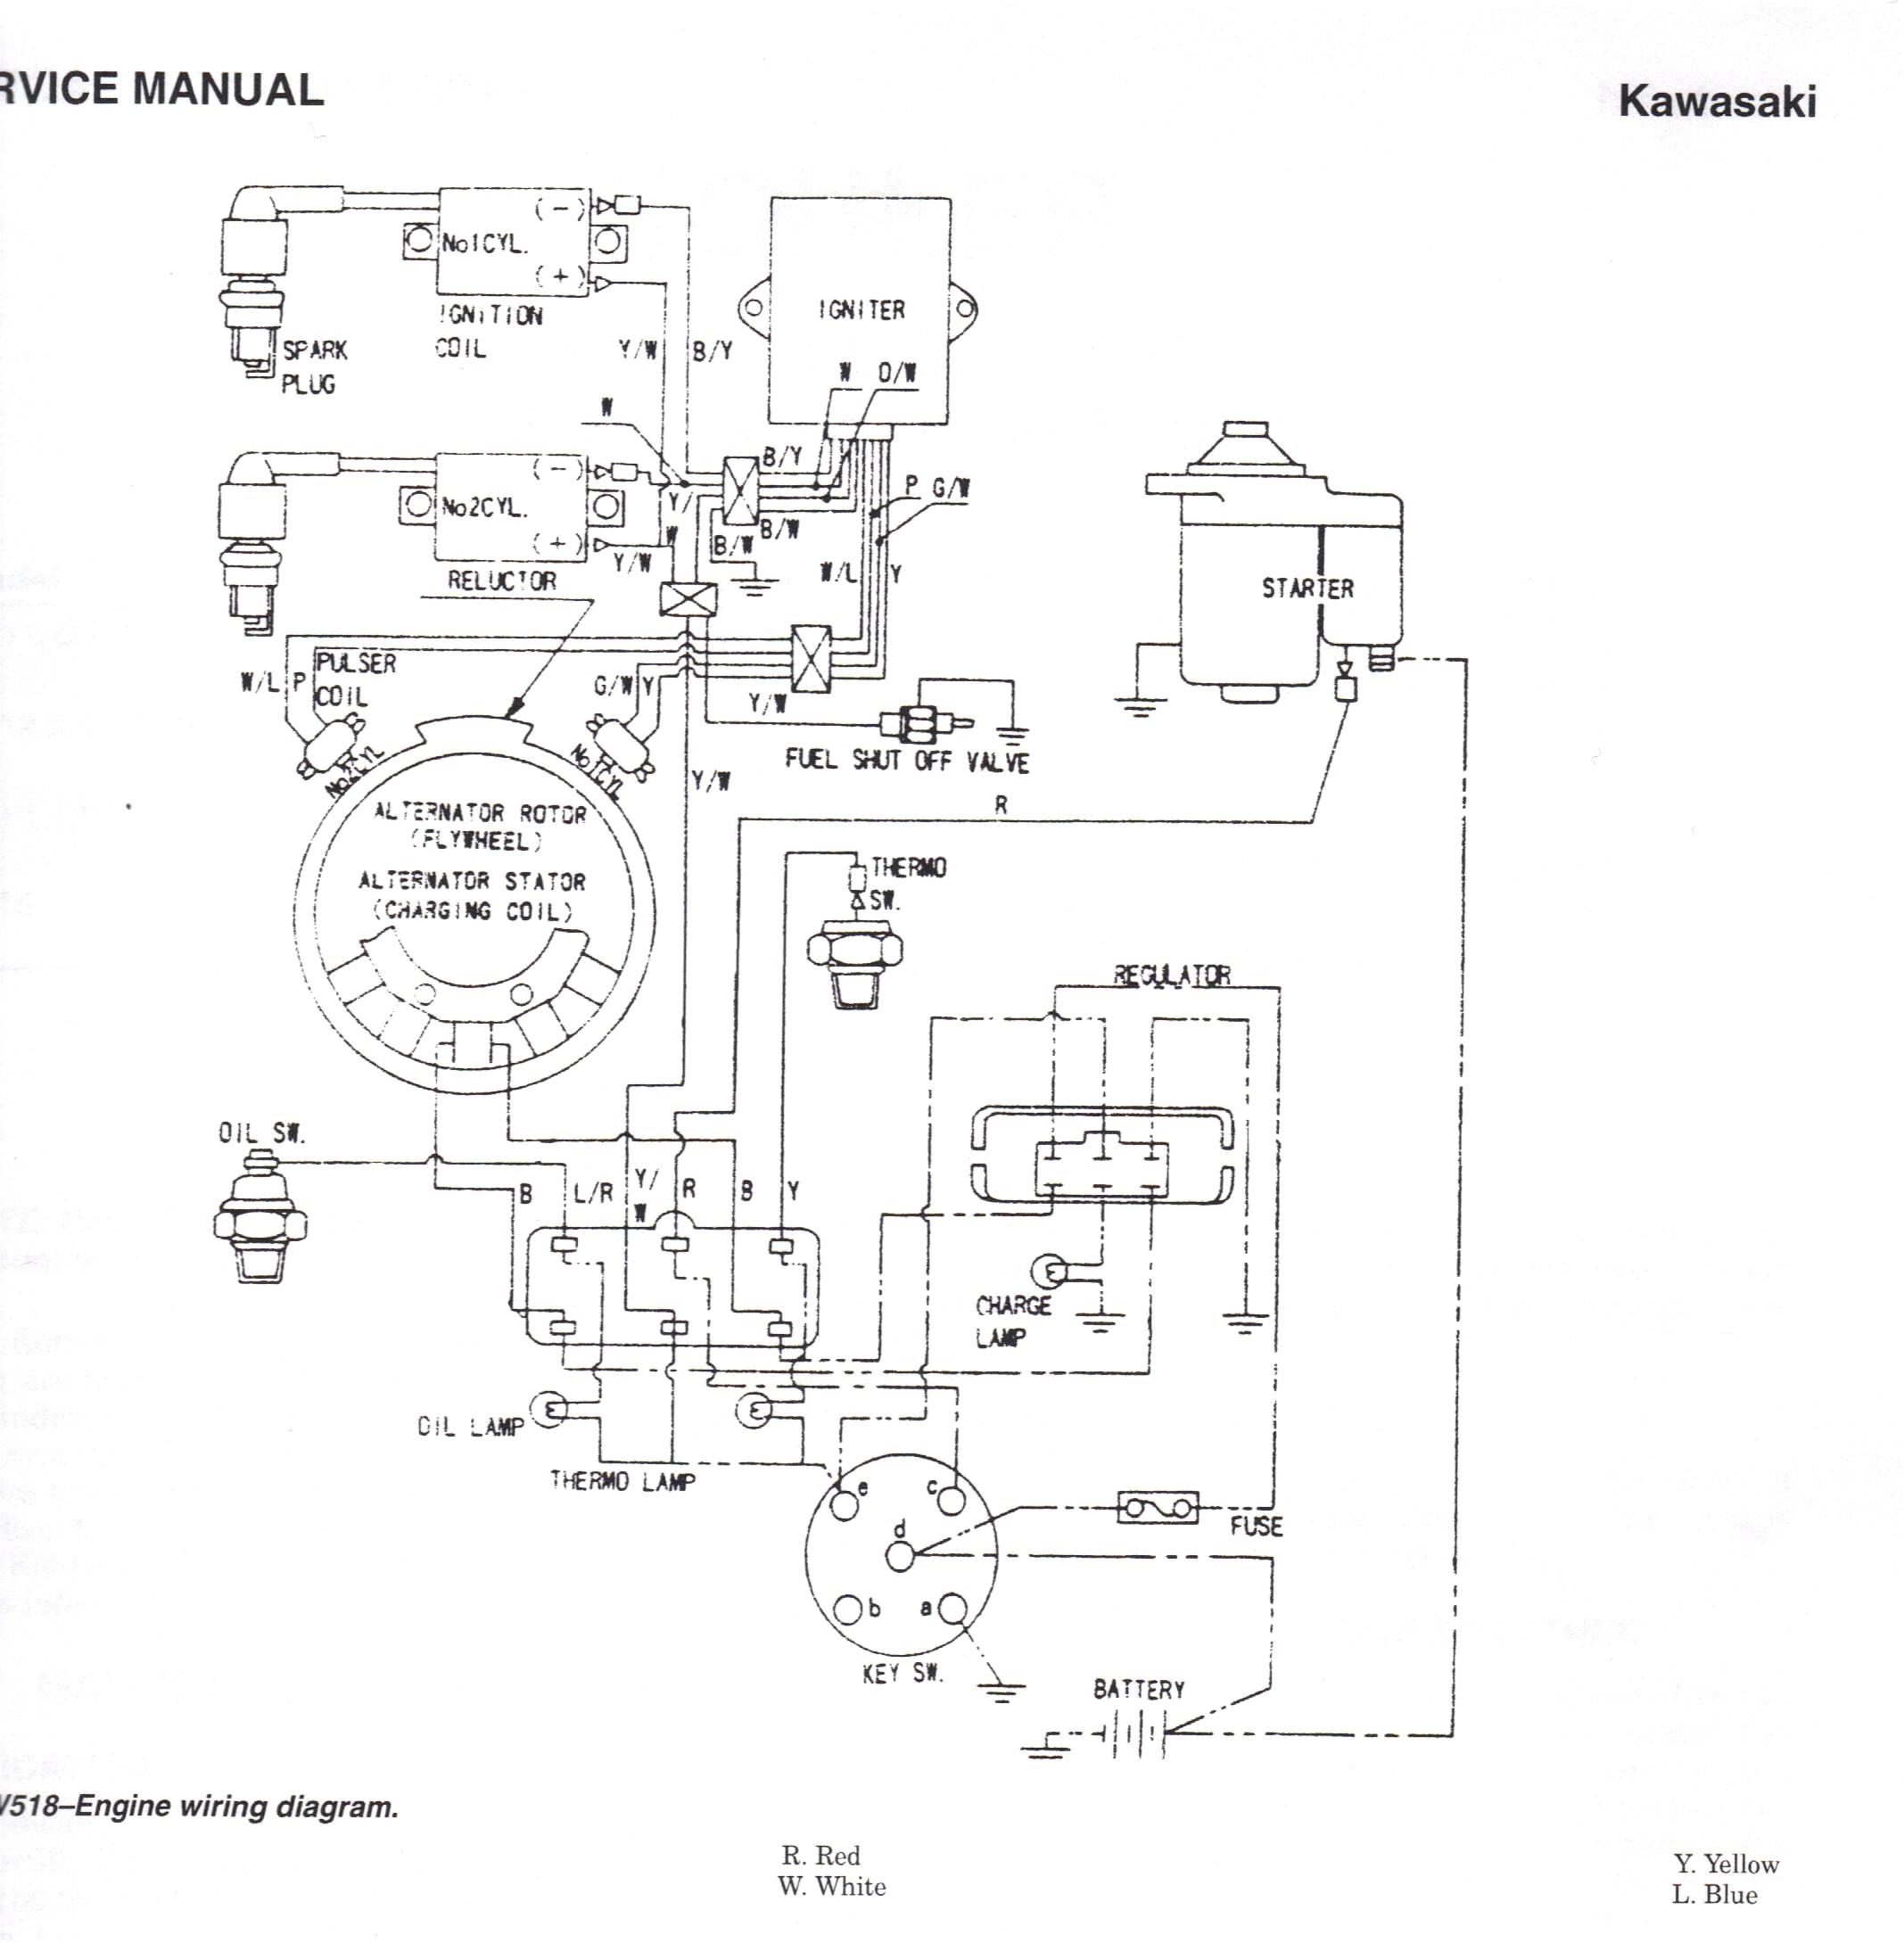 john deere 325 wiring diagram - auto electrical wiring diagram on john  deere 318 schematic,